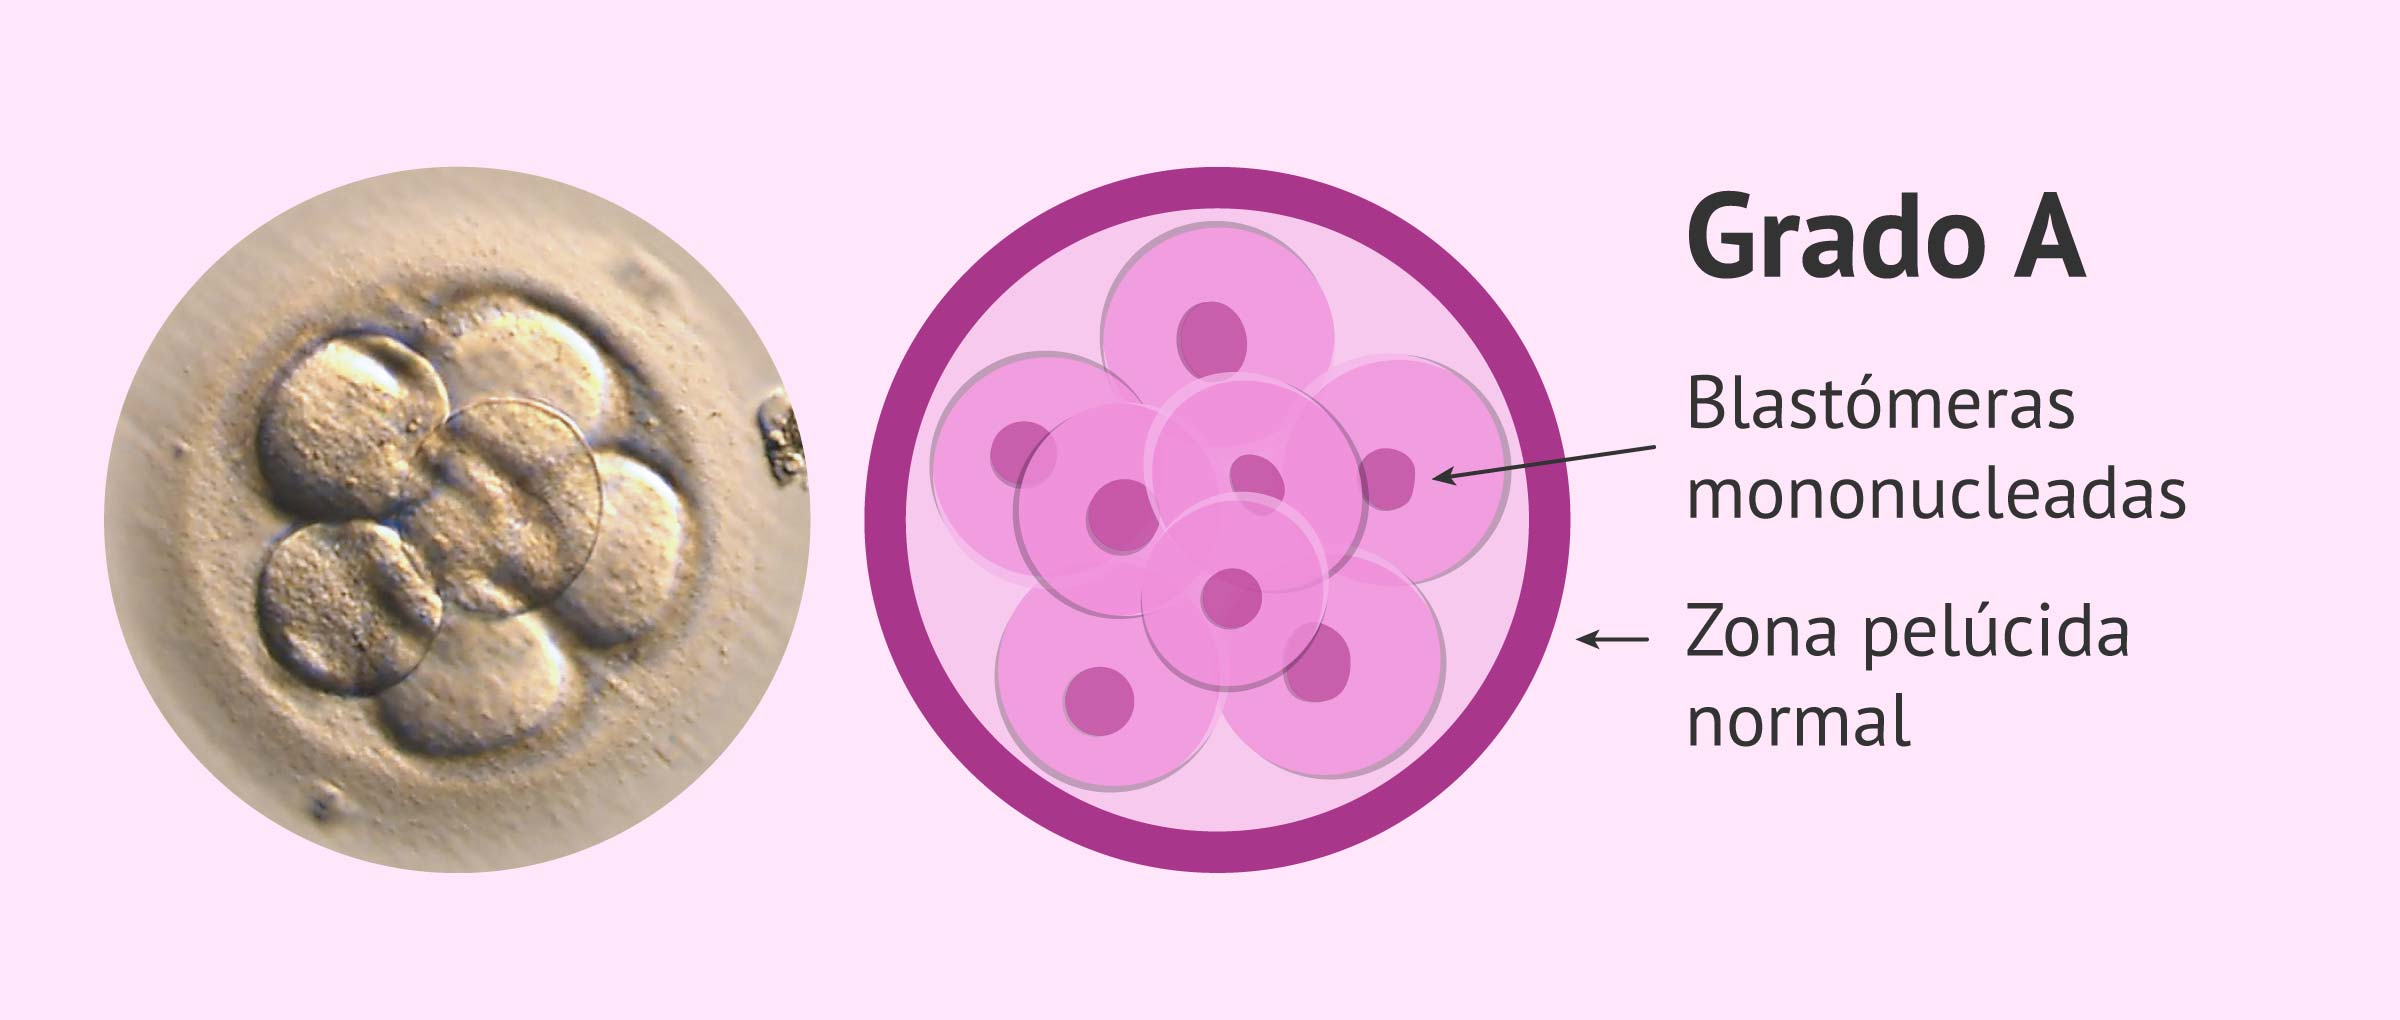 Calidad embrionaria: grado A